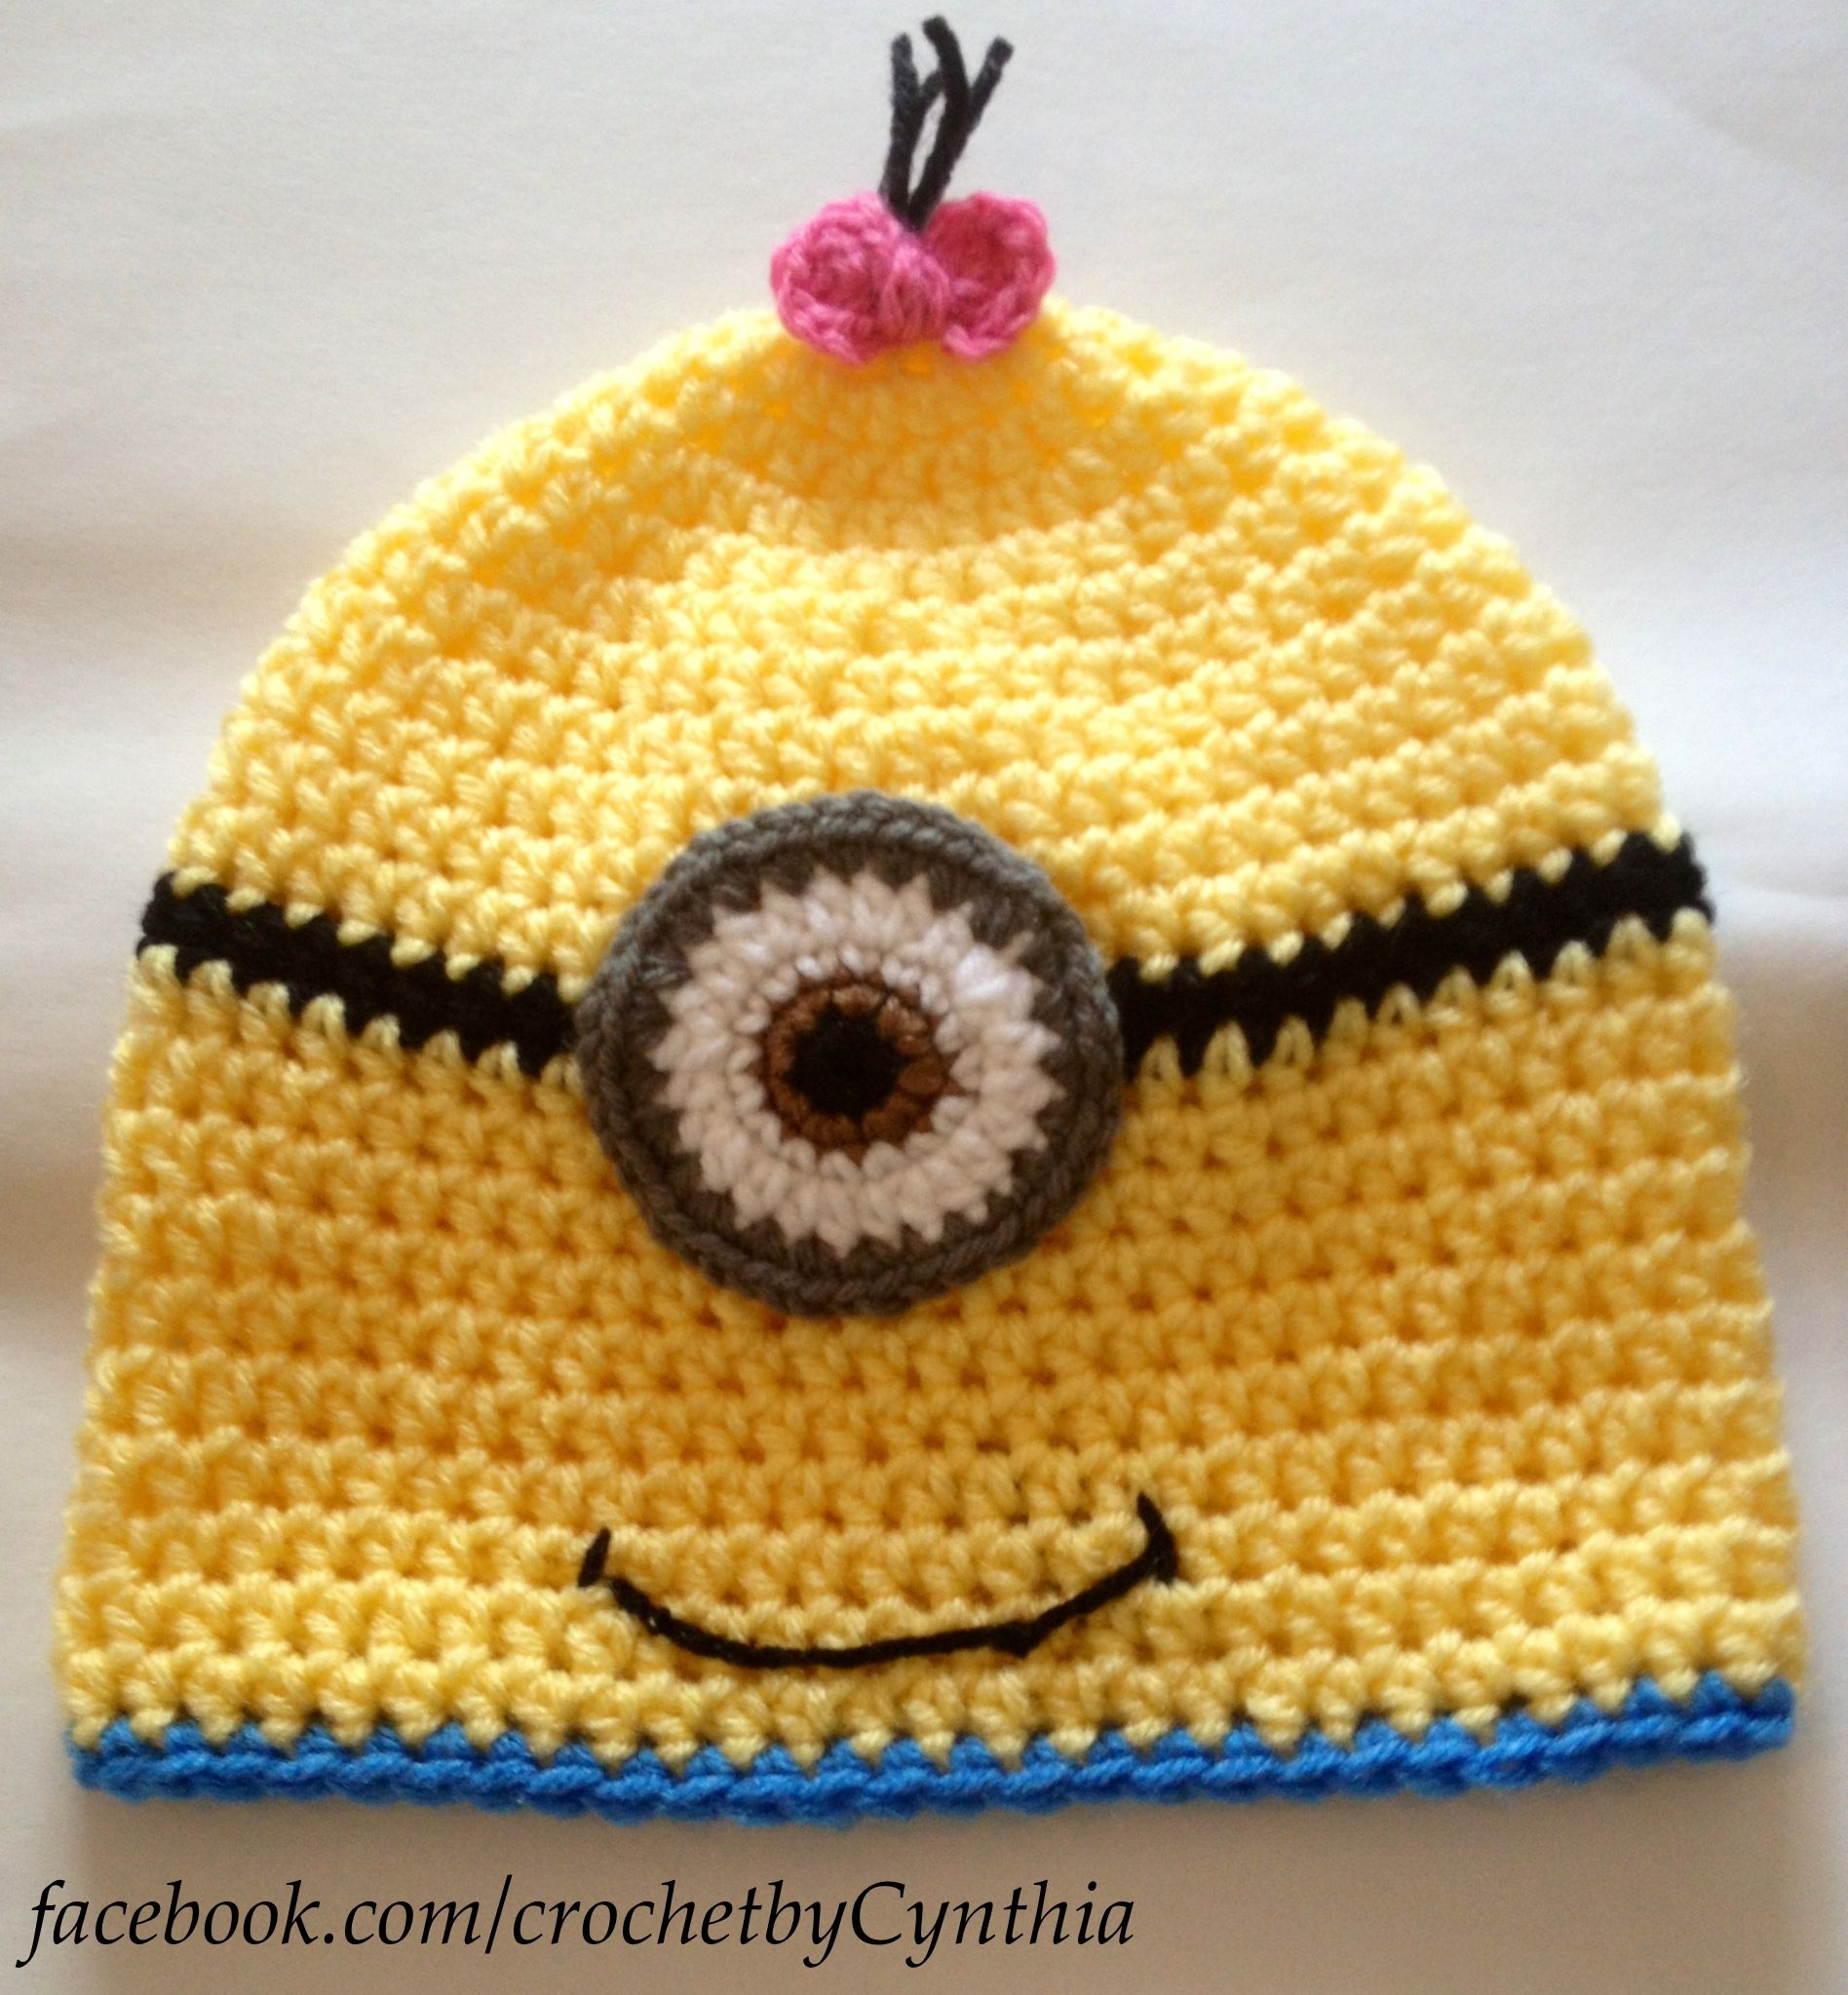 Crochet hat- despicable me inspired girl minion | Crochet! | Pinterest